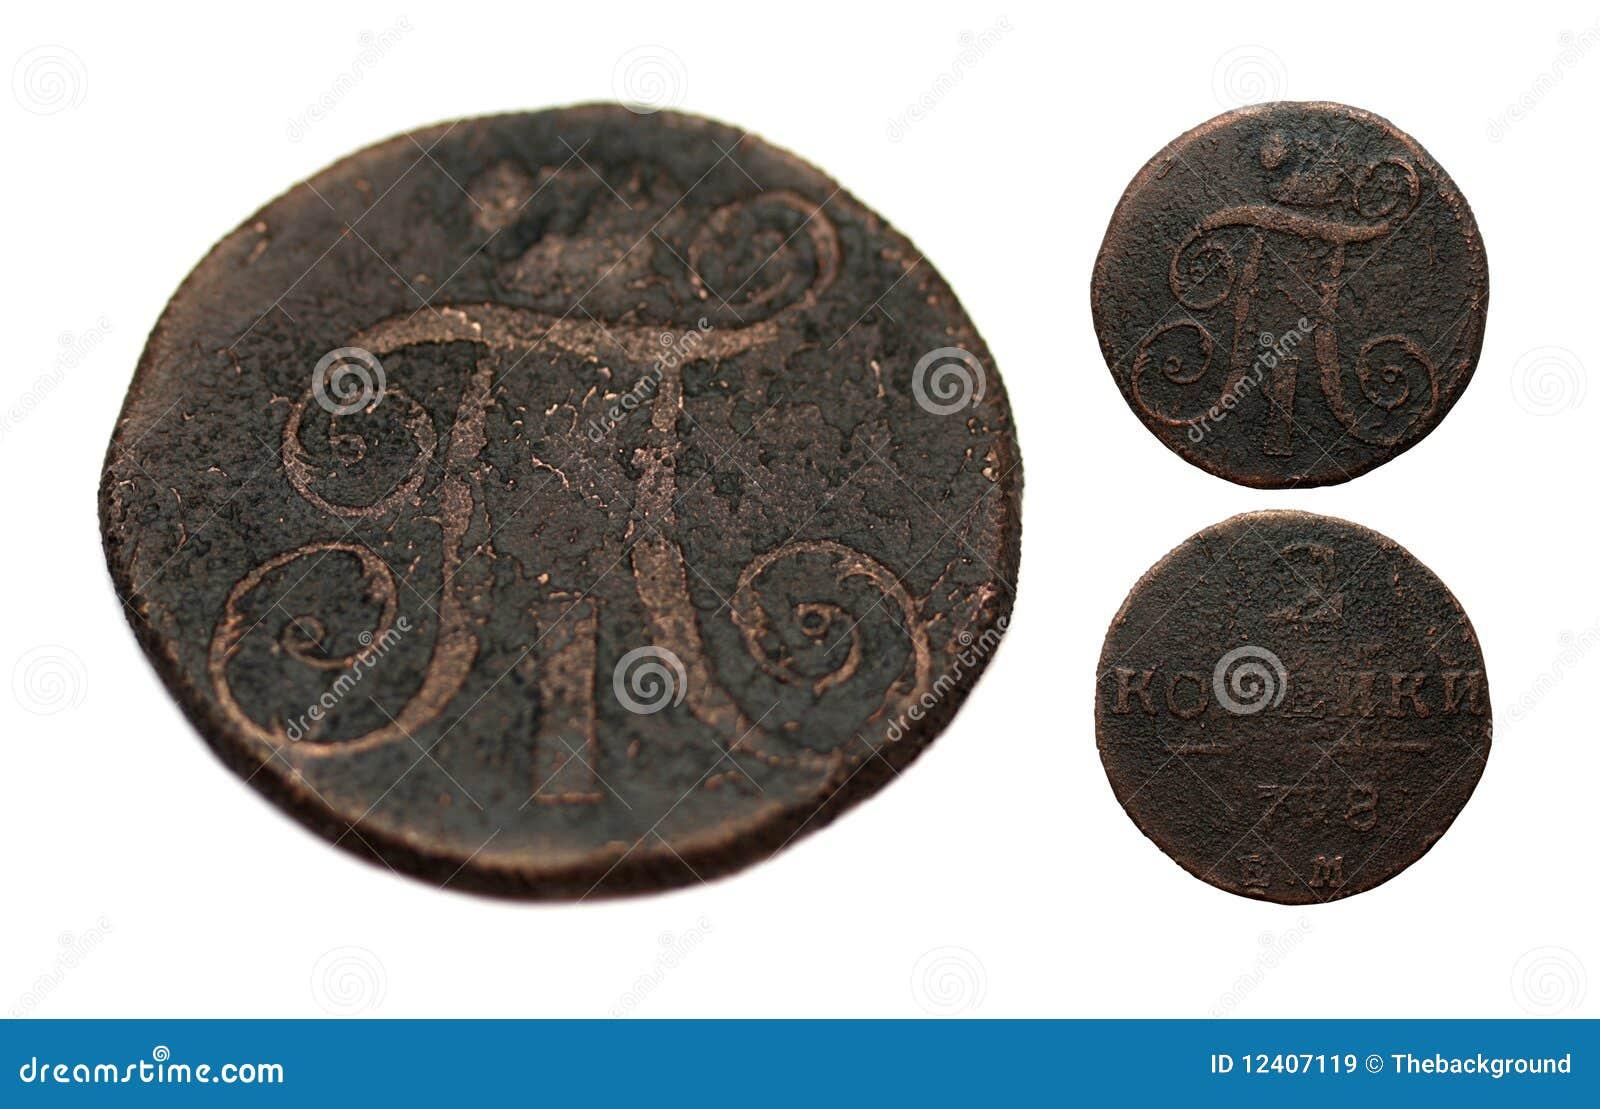 русский редкости pavel 2 1798 copecks i монетки